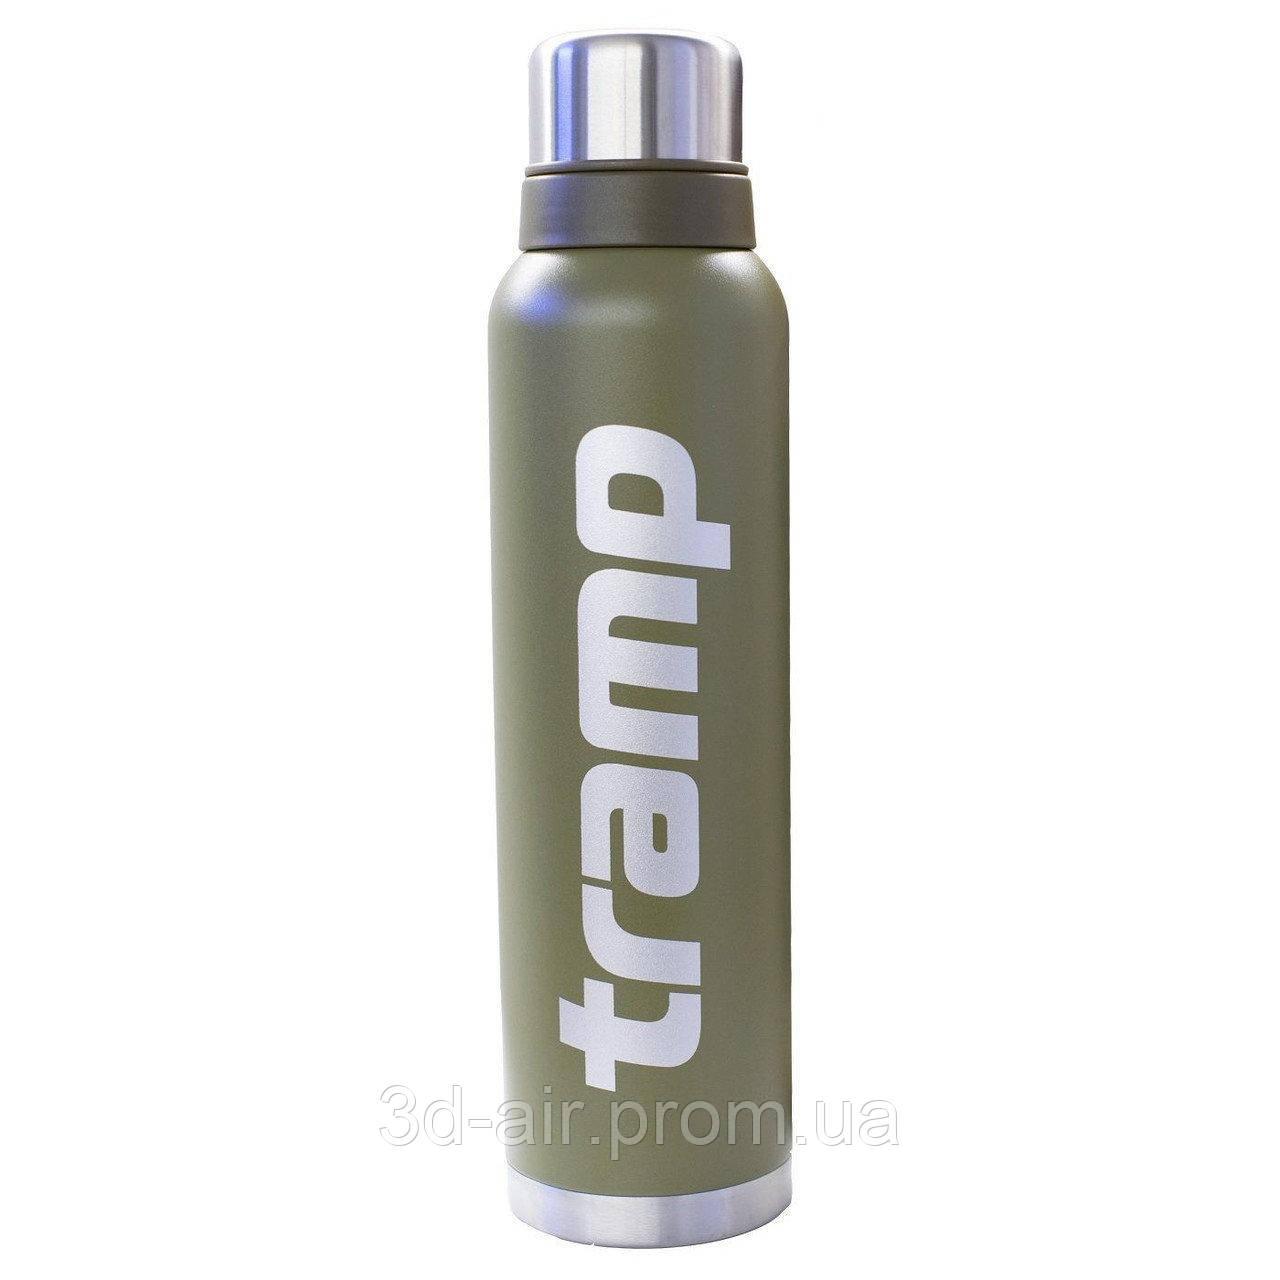 Tramp Термос 1,6 л TRC-029 olive